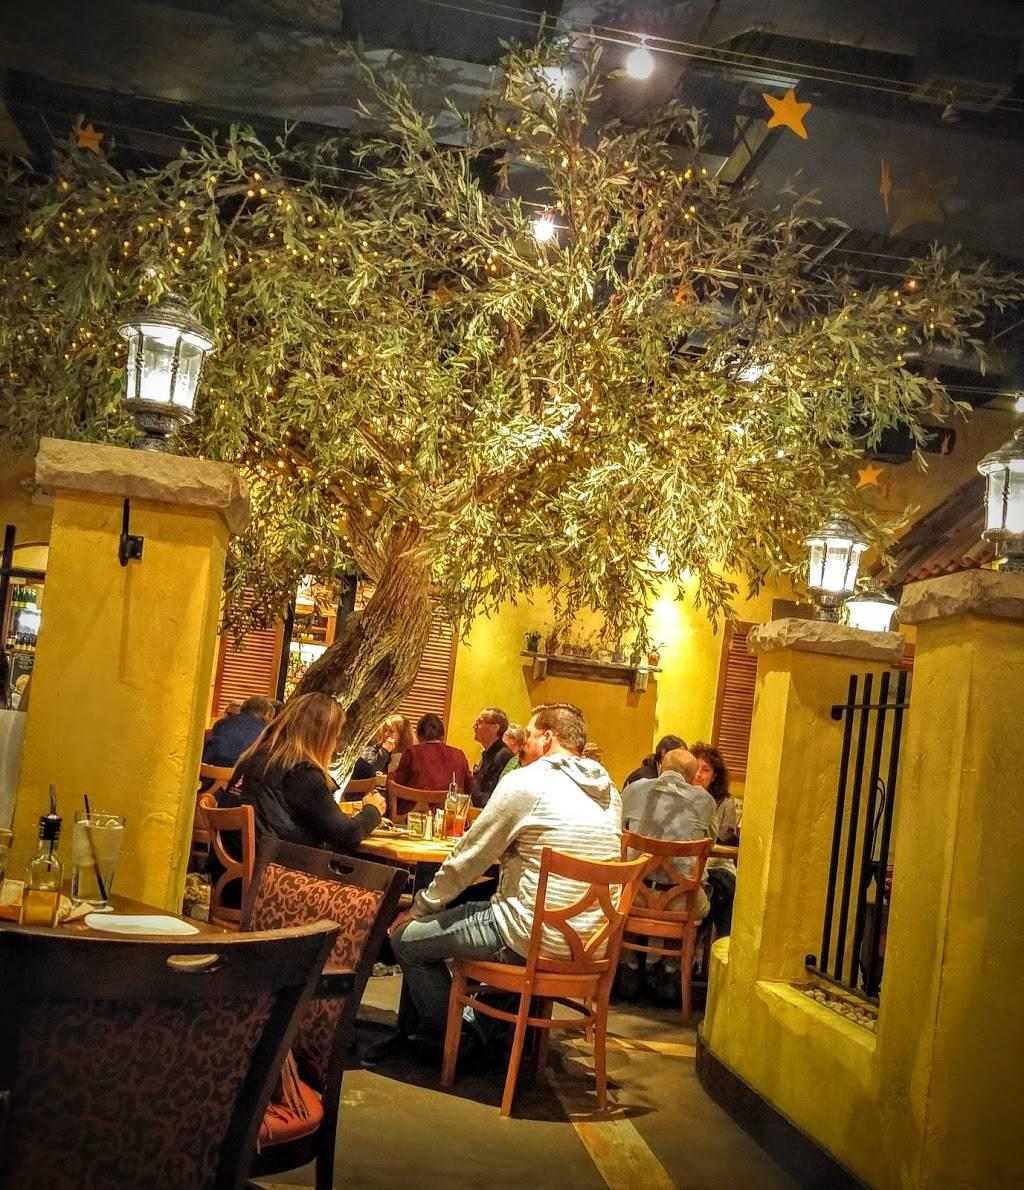 Bella Notte - restaurant  | Photo 4 of 10 | Address: 3715 Nicholasville Rd, Lexington, KY 40503, USA | Phone: (859) 245-1789